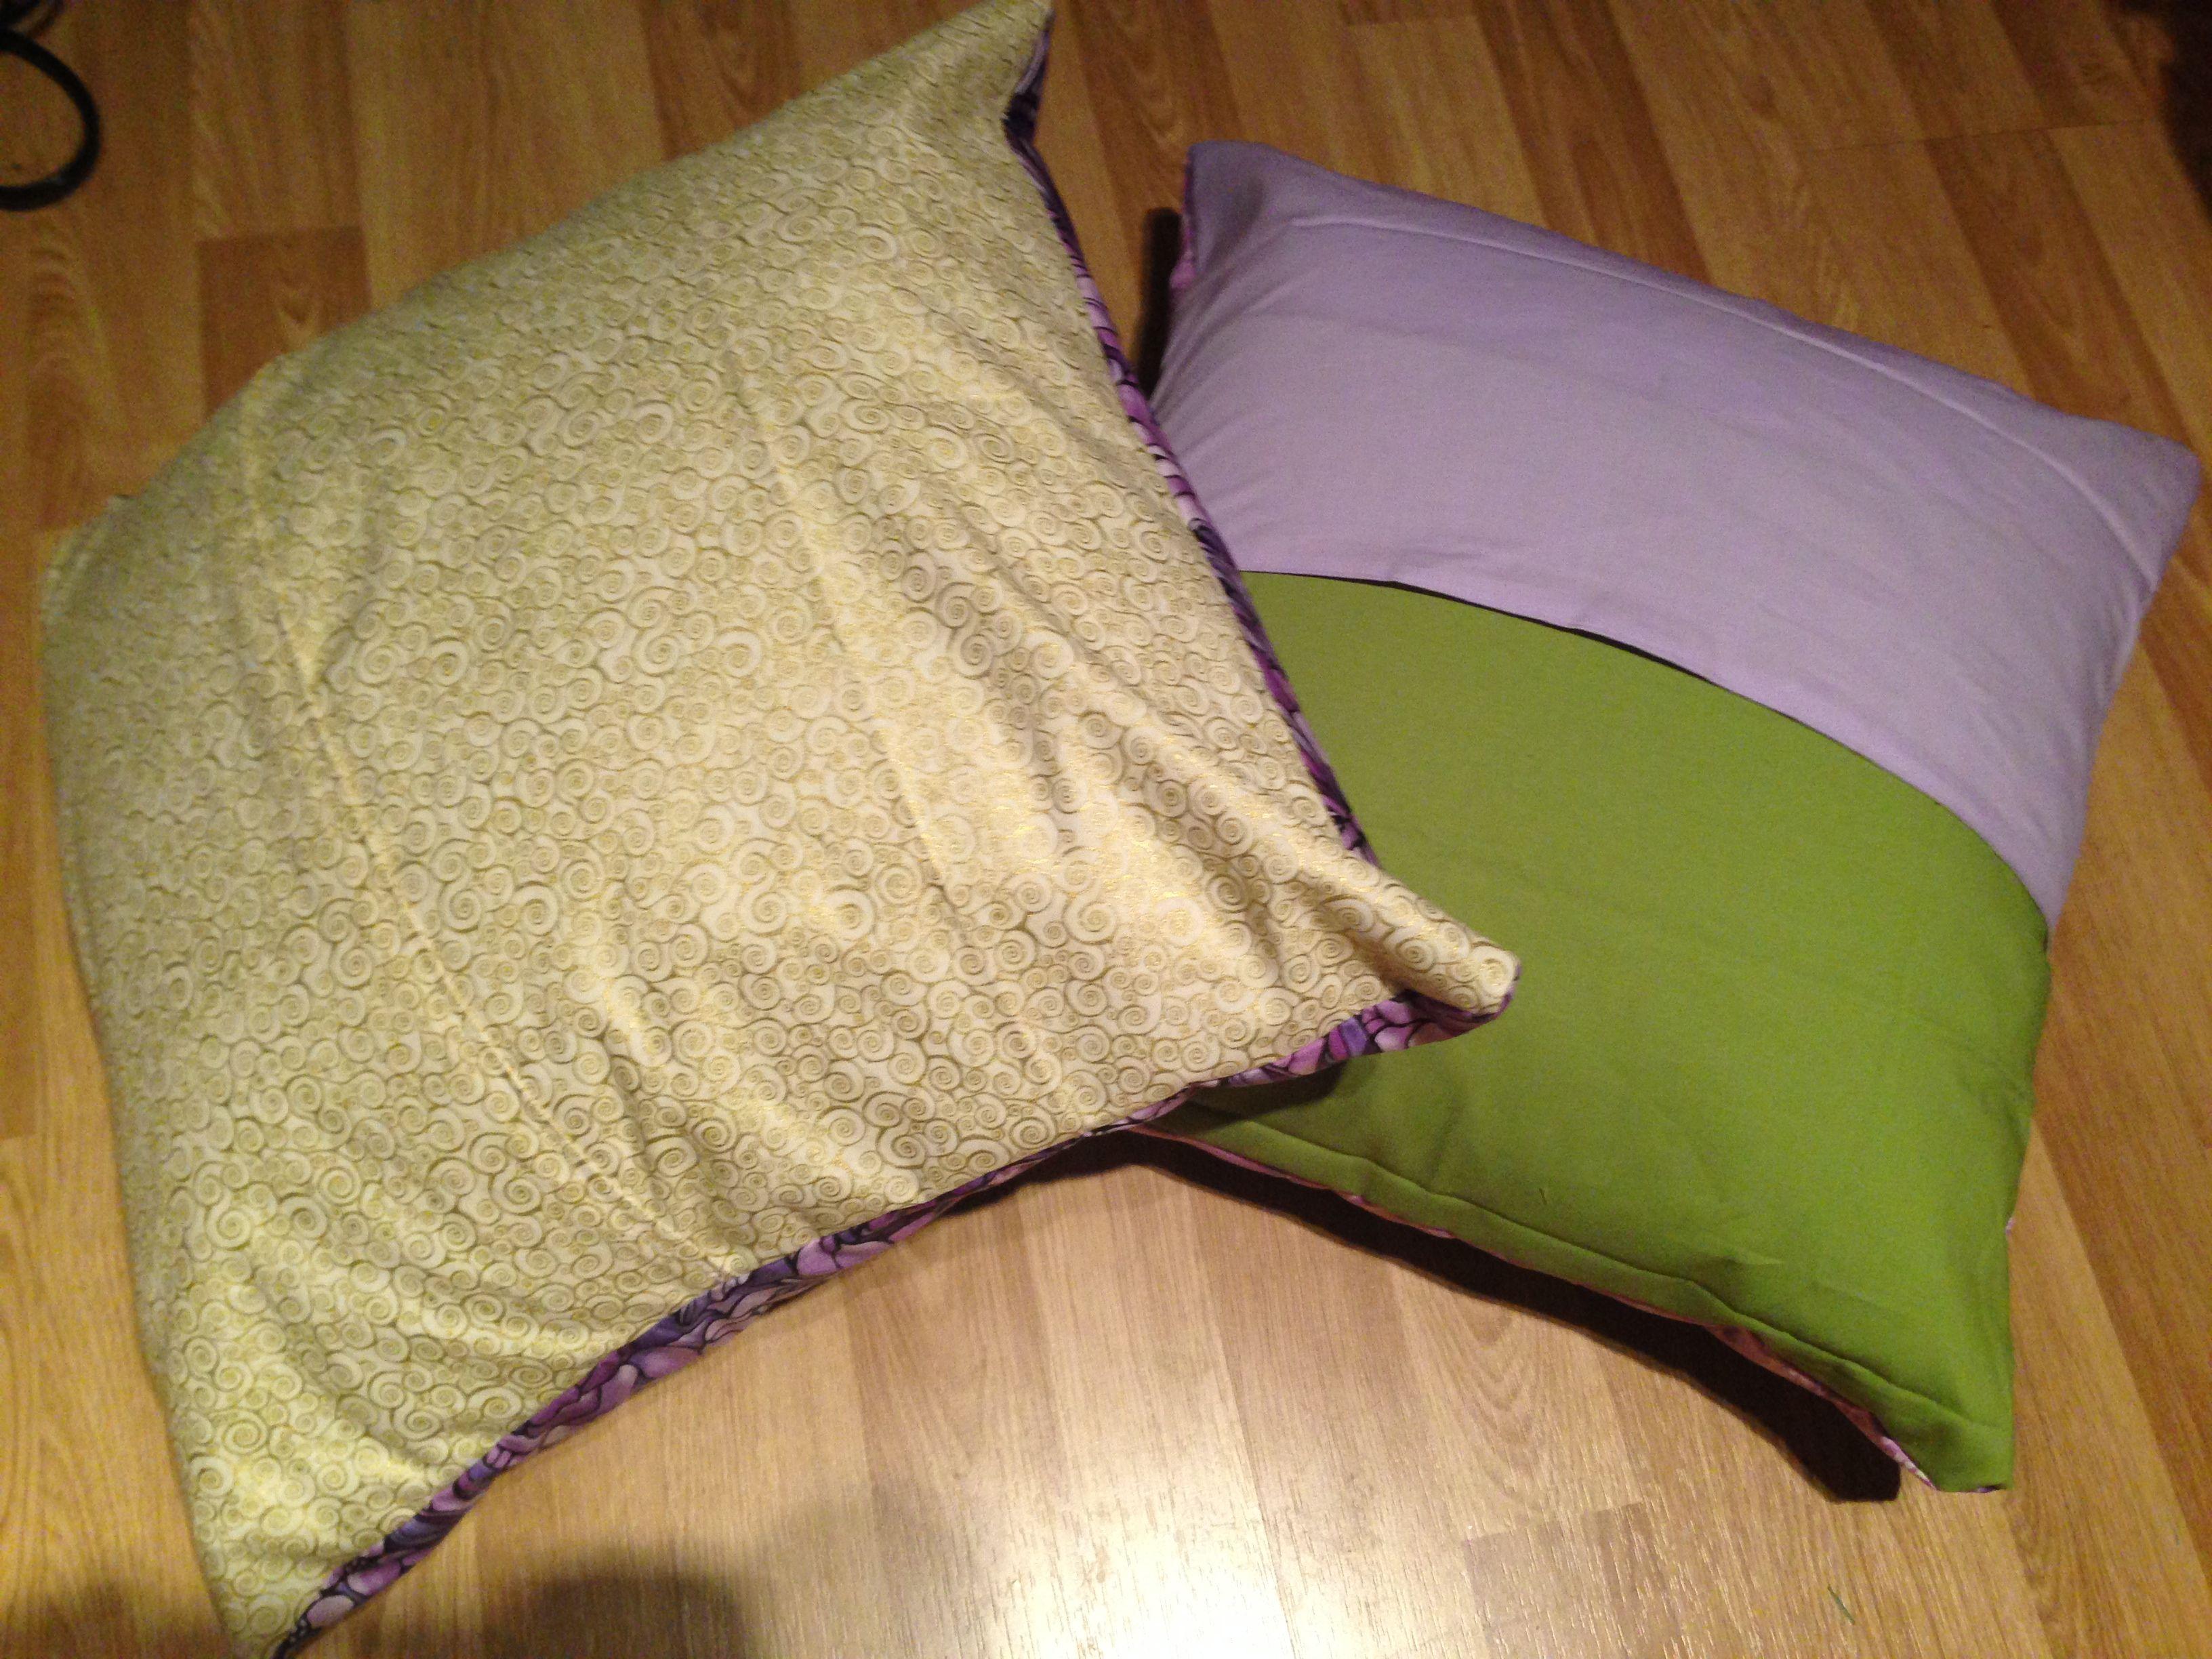 Backs of purple cushions